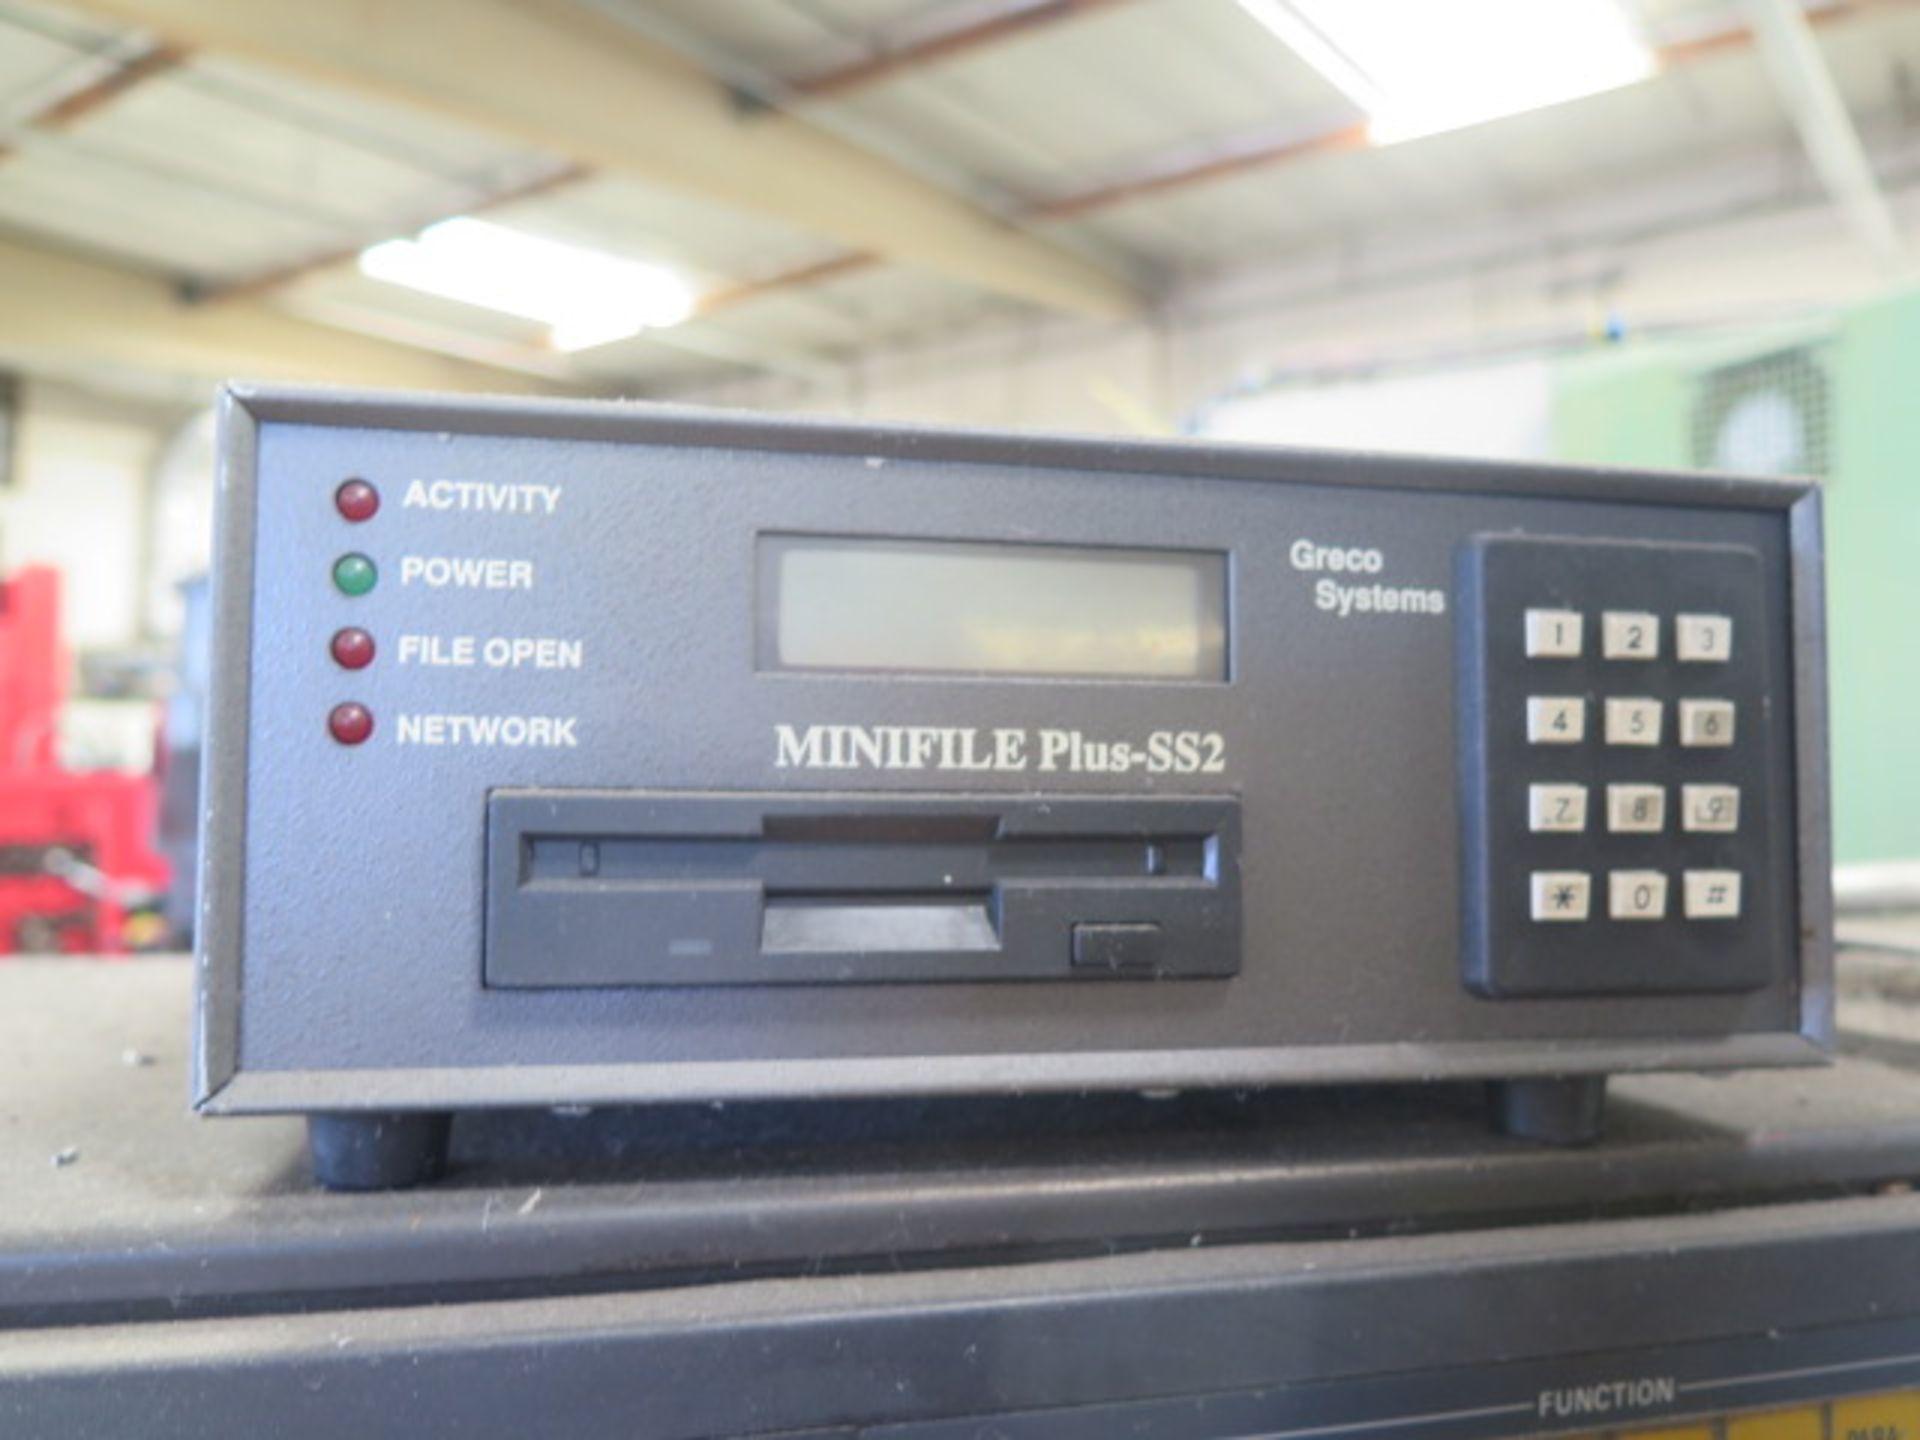 Tsugami NM3 CNC Turning Center s/n 6029 w/ Mitsubishi Meldas Controls, 8-Station Turret, SOLD AS IS - Image 8 of 16